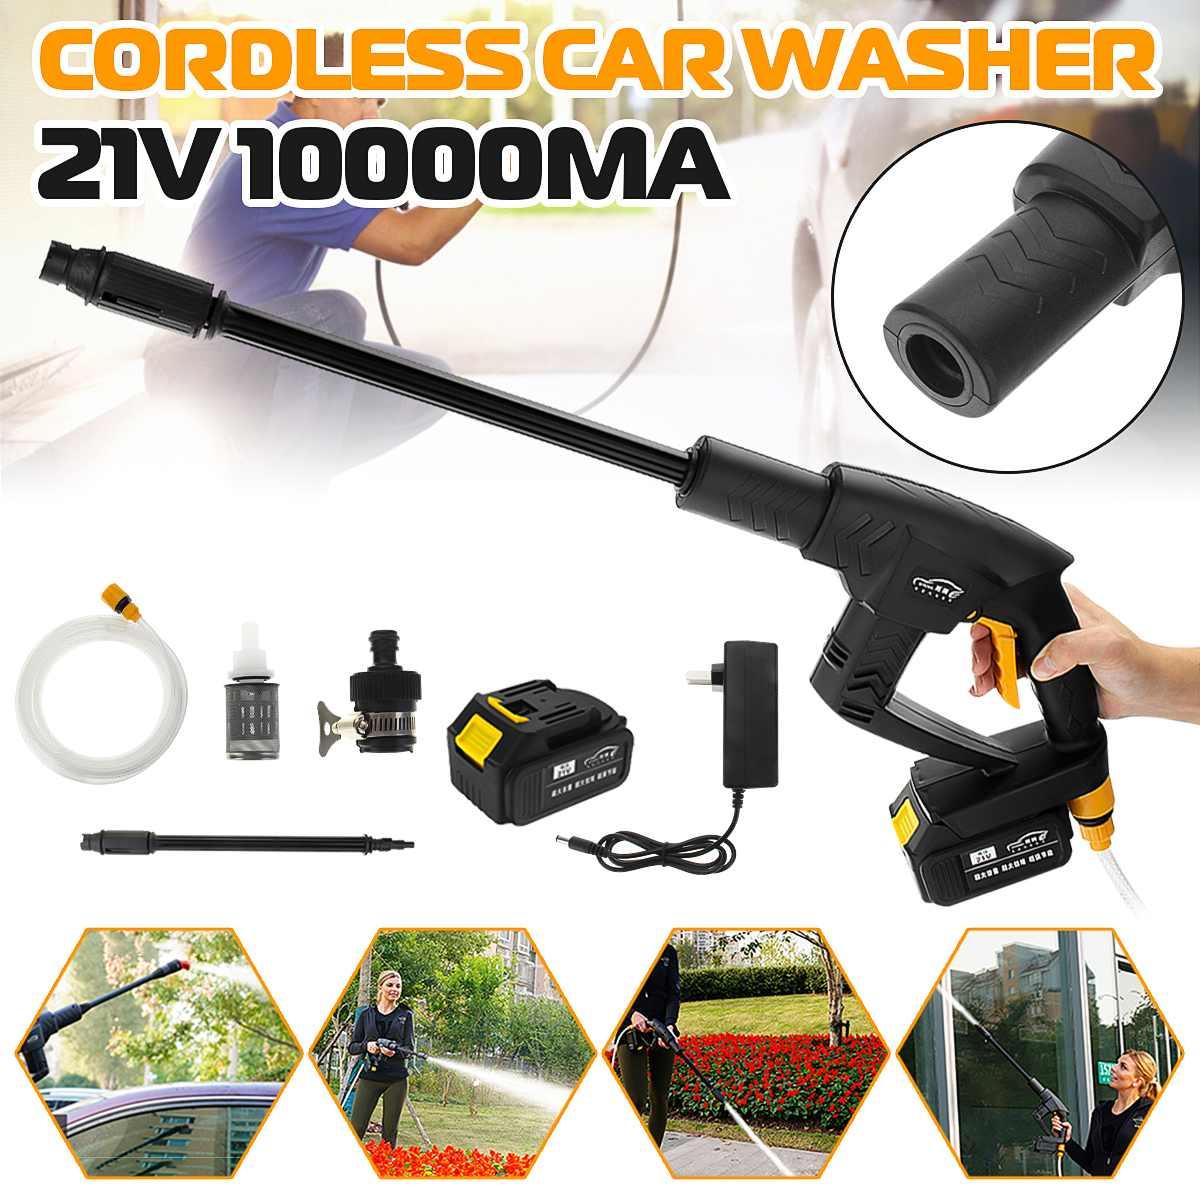 7-12pcs/set 21V Cordless Rechargeable Car Washer Mashine 0.9Mpa High Pressure Nozzle Hose Cleaner+ 10000mA Battery Washing Pump